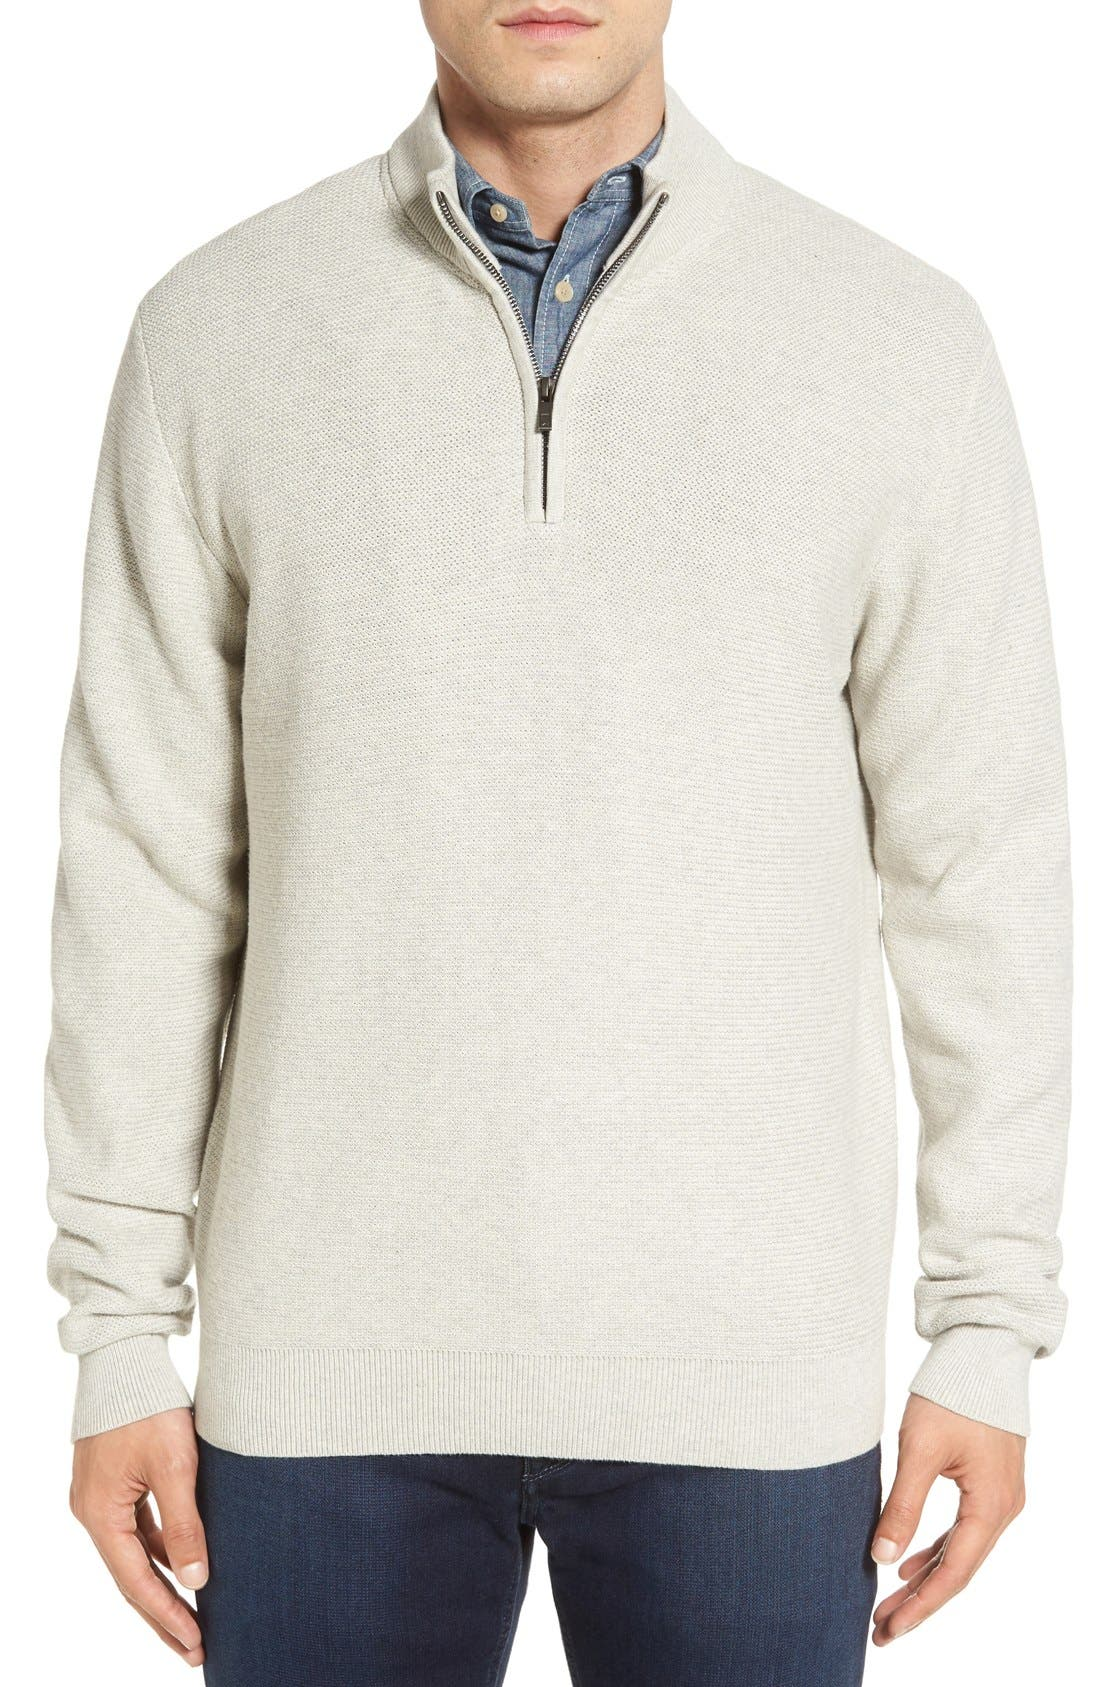 'Benson' Quarter Zip Textured Knit Sweater,                             Main thumbnail 1, color,                             Limestone Heather